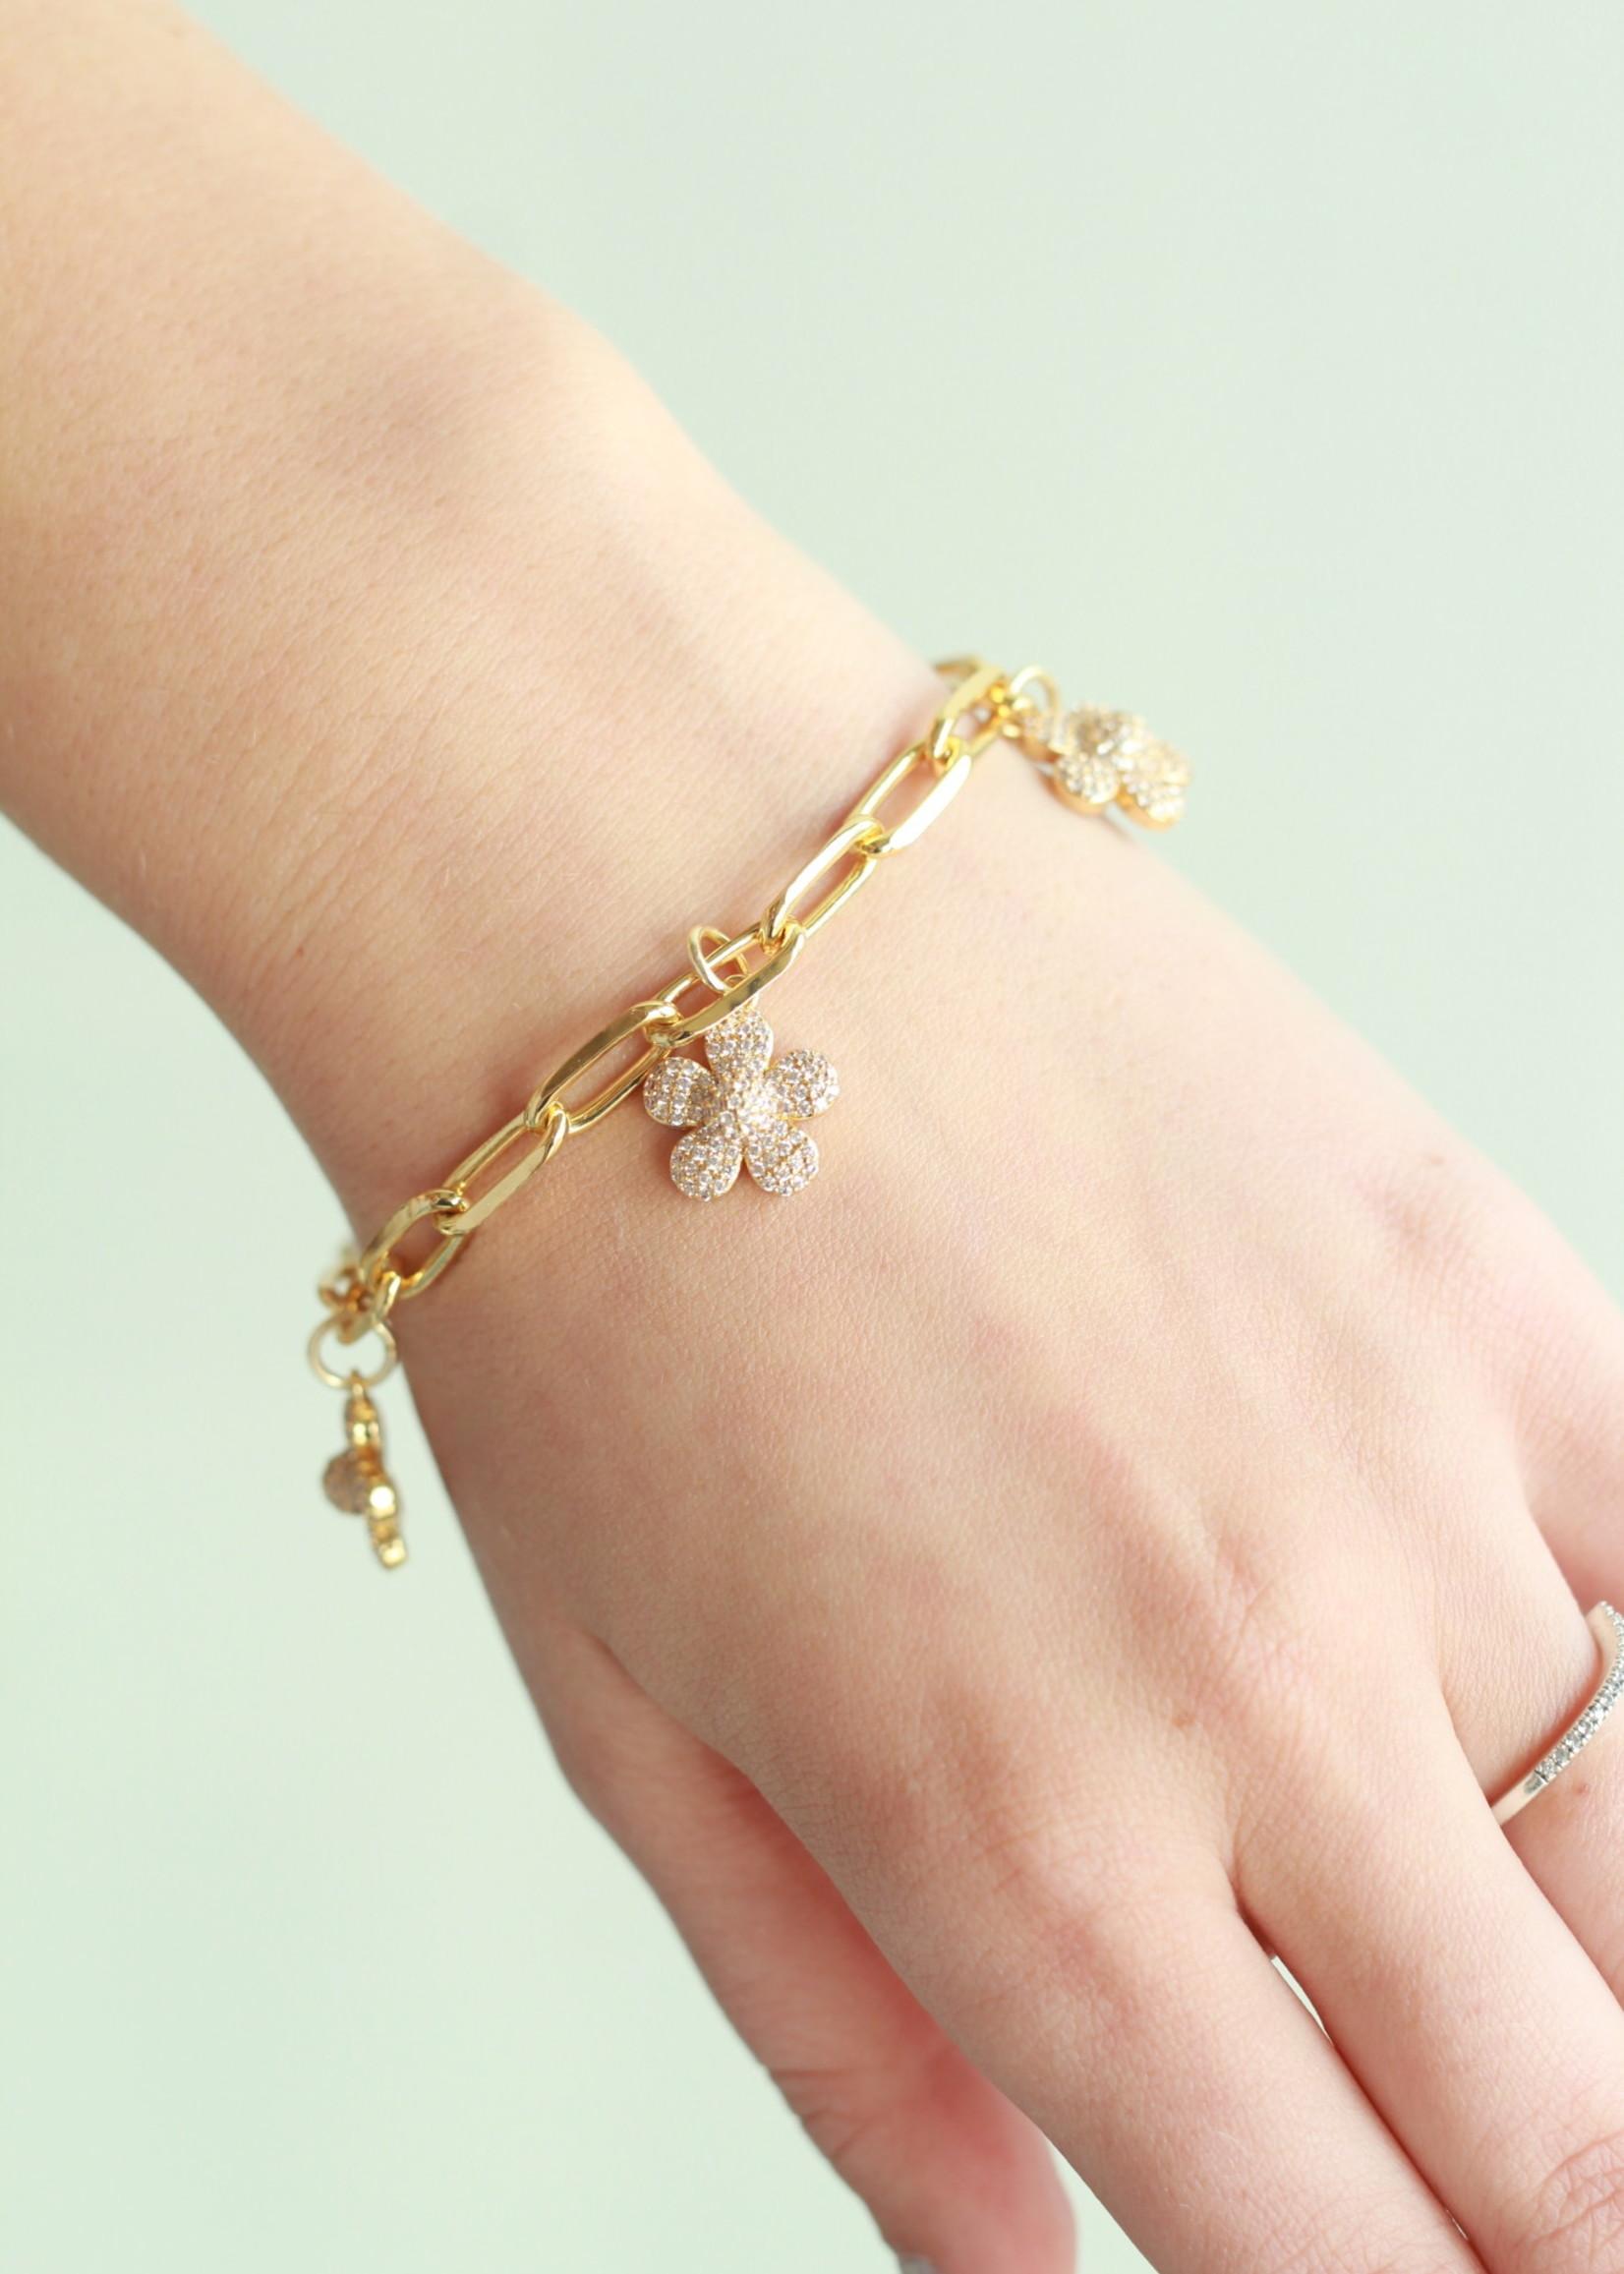 Allison Conway AC Gold Daisy Charm Bracelet